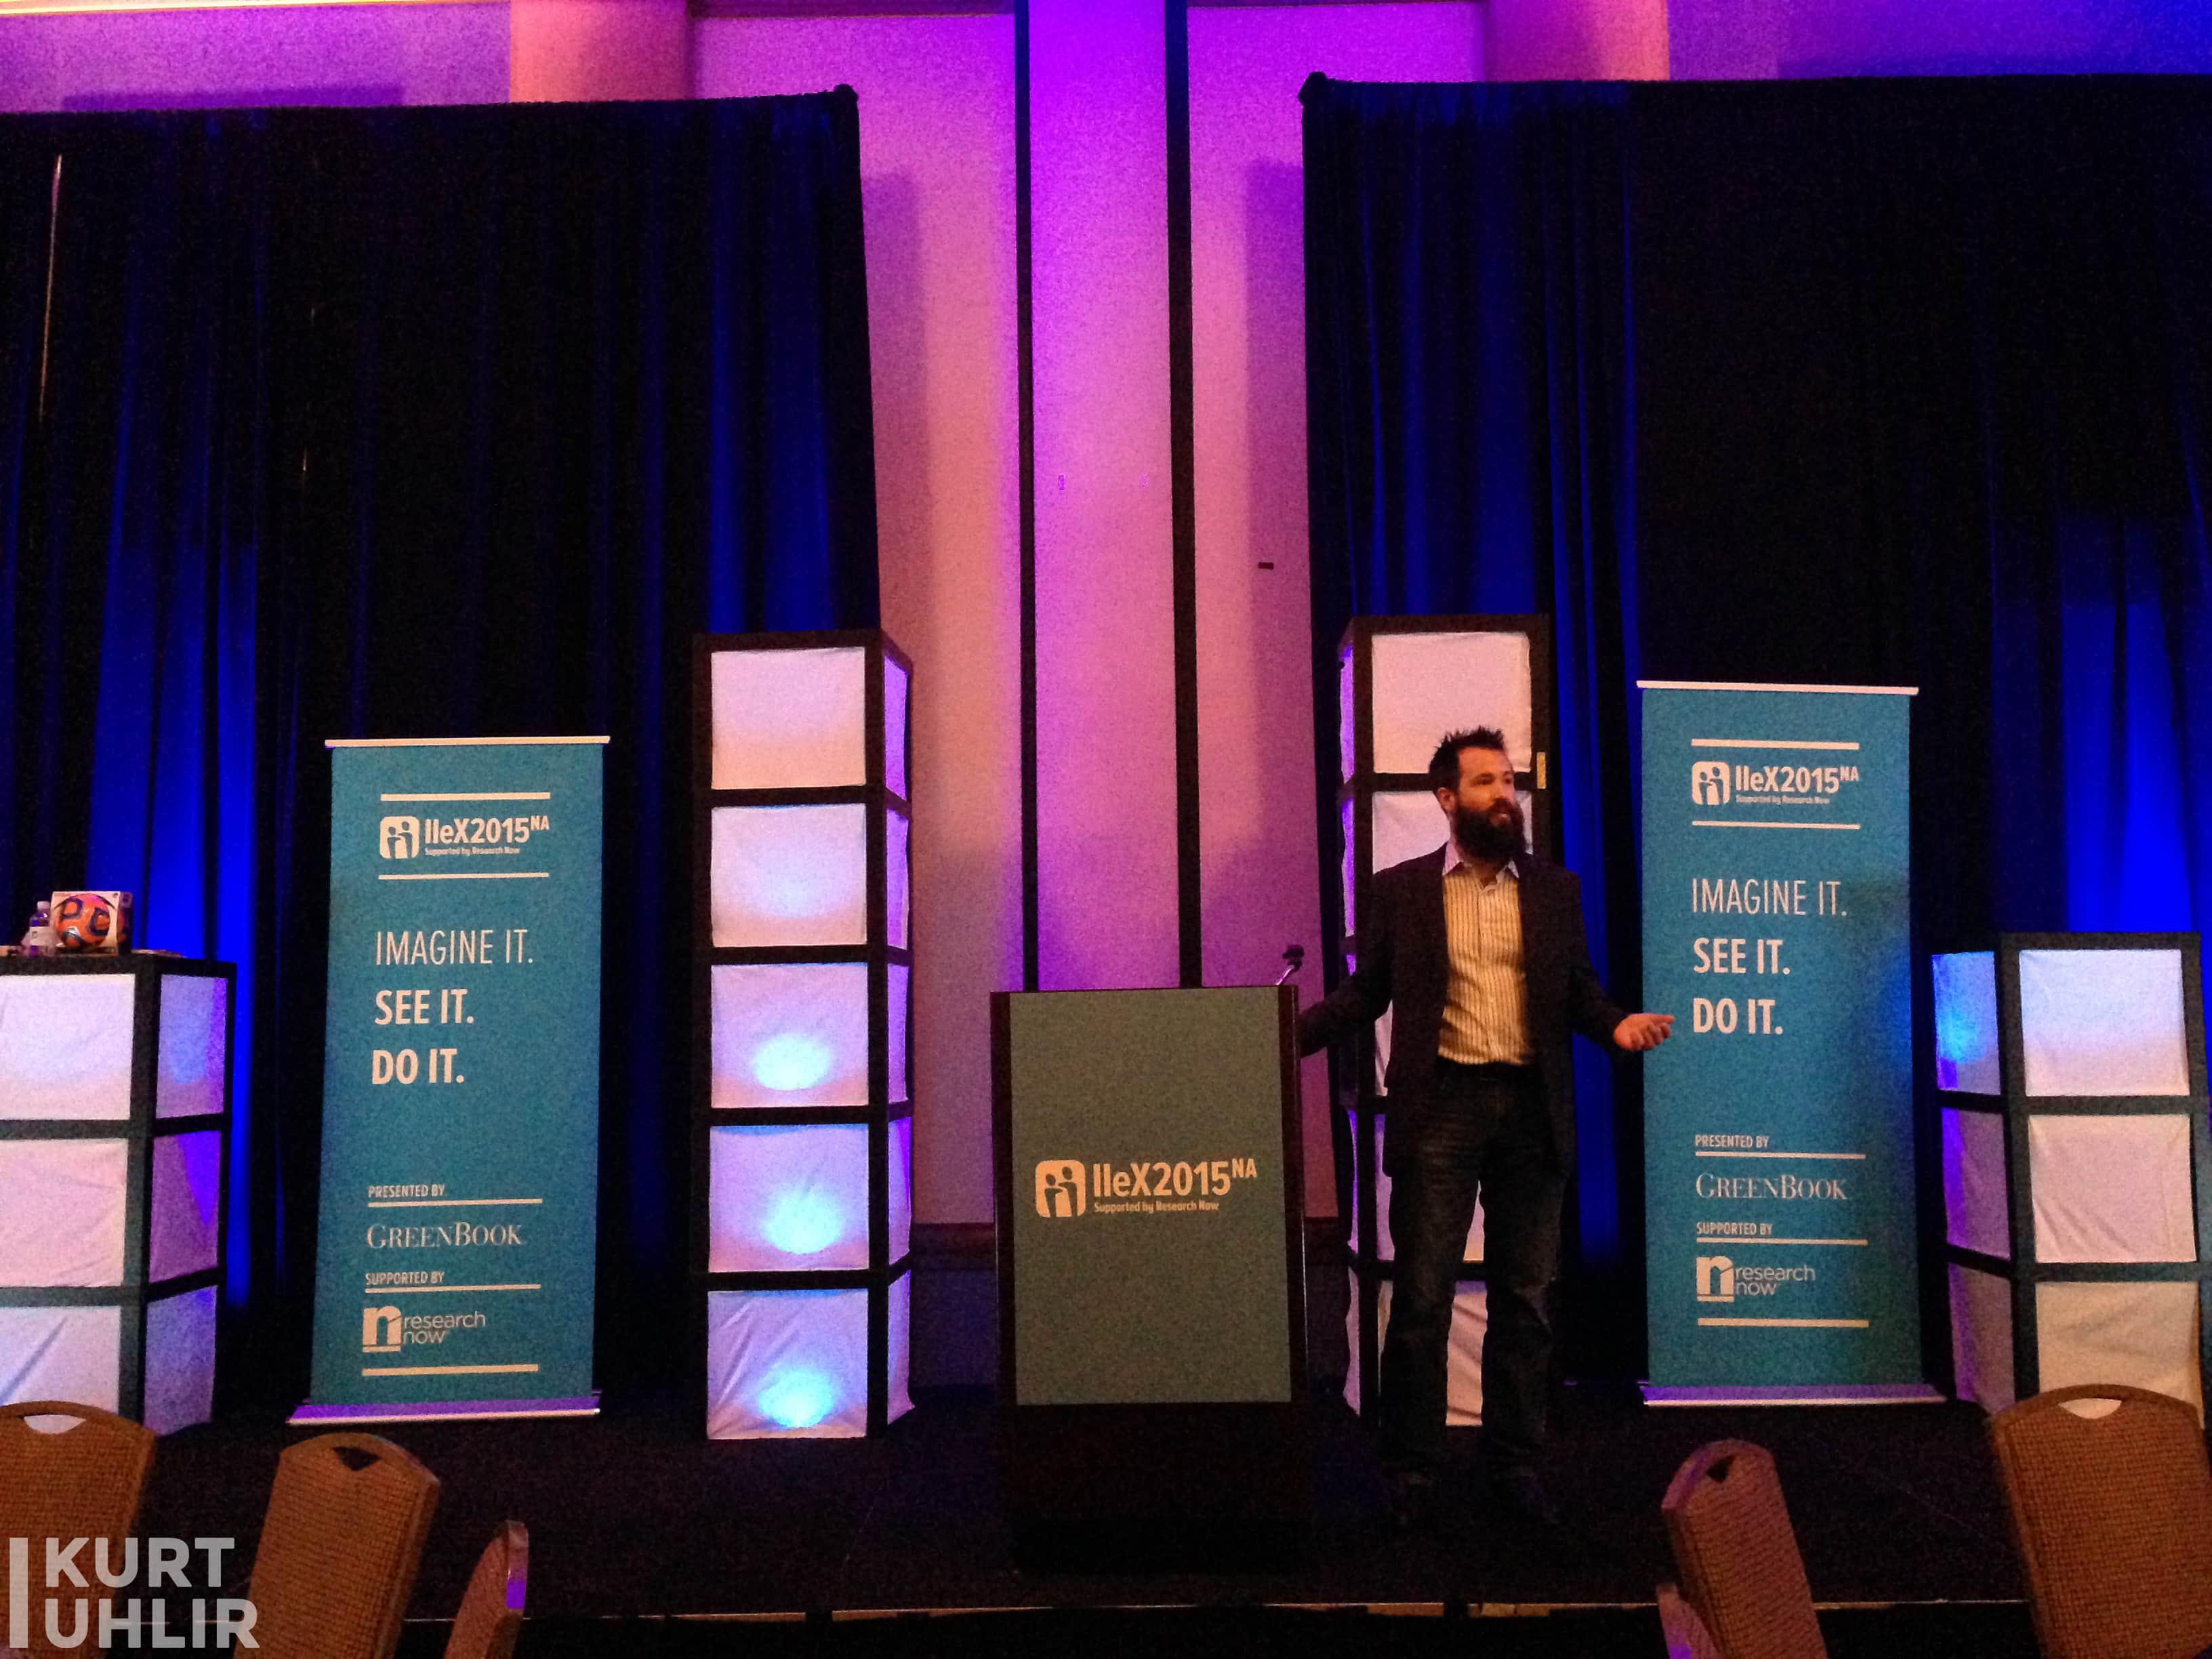 Kurt Uhlir speaking on innovation and disruption at conference